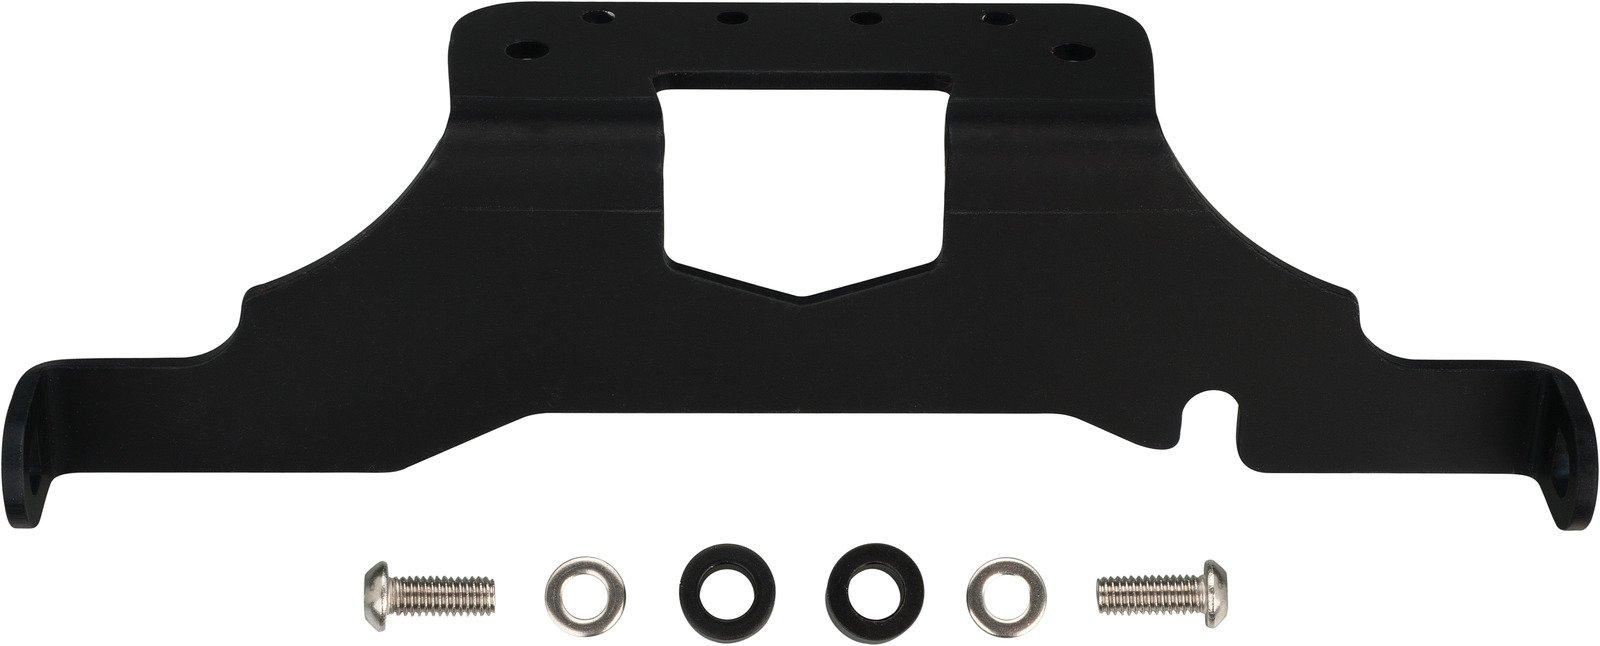 Triumph Bonneville Scrambler Thruxton  Front Indicator Bracket incl. Material for 41085/41135 Indicators JVB0026S